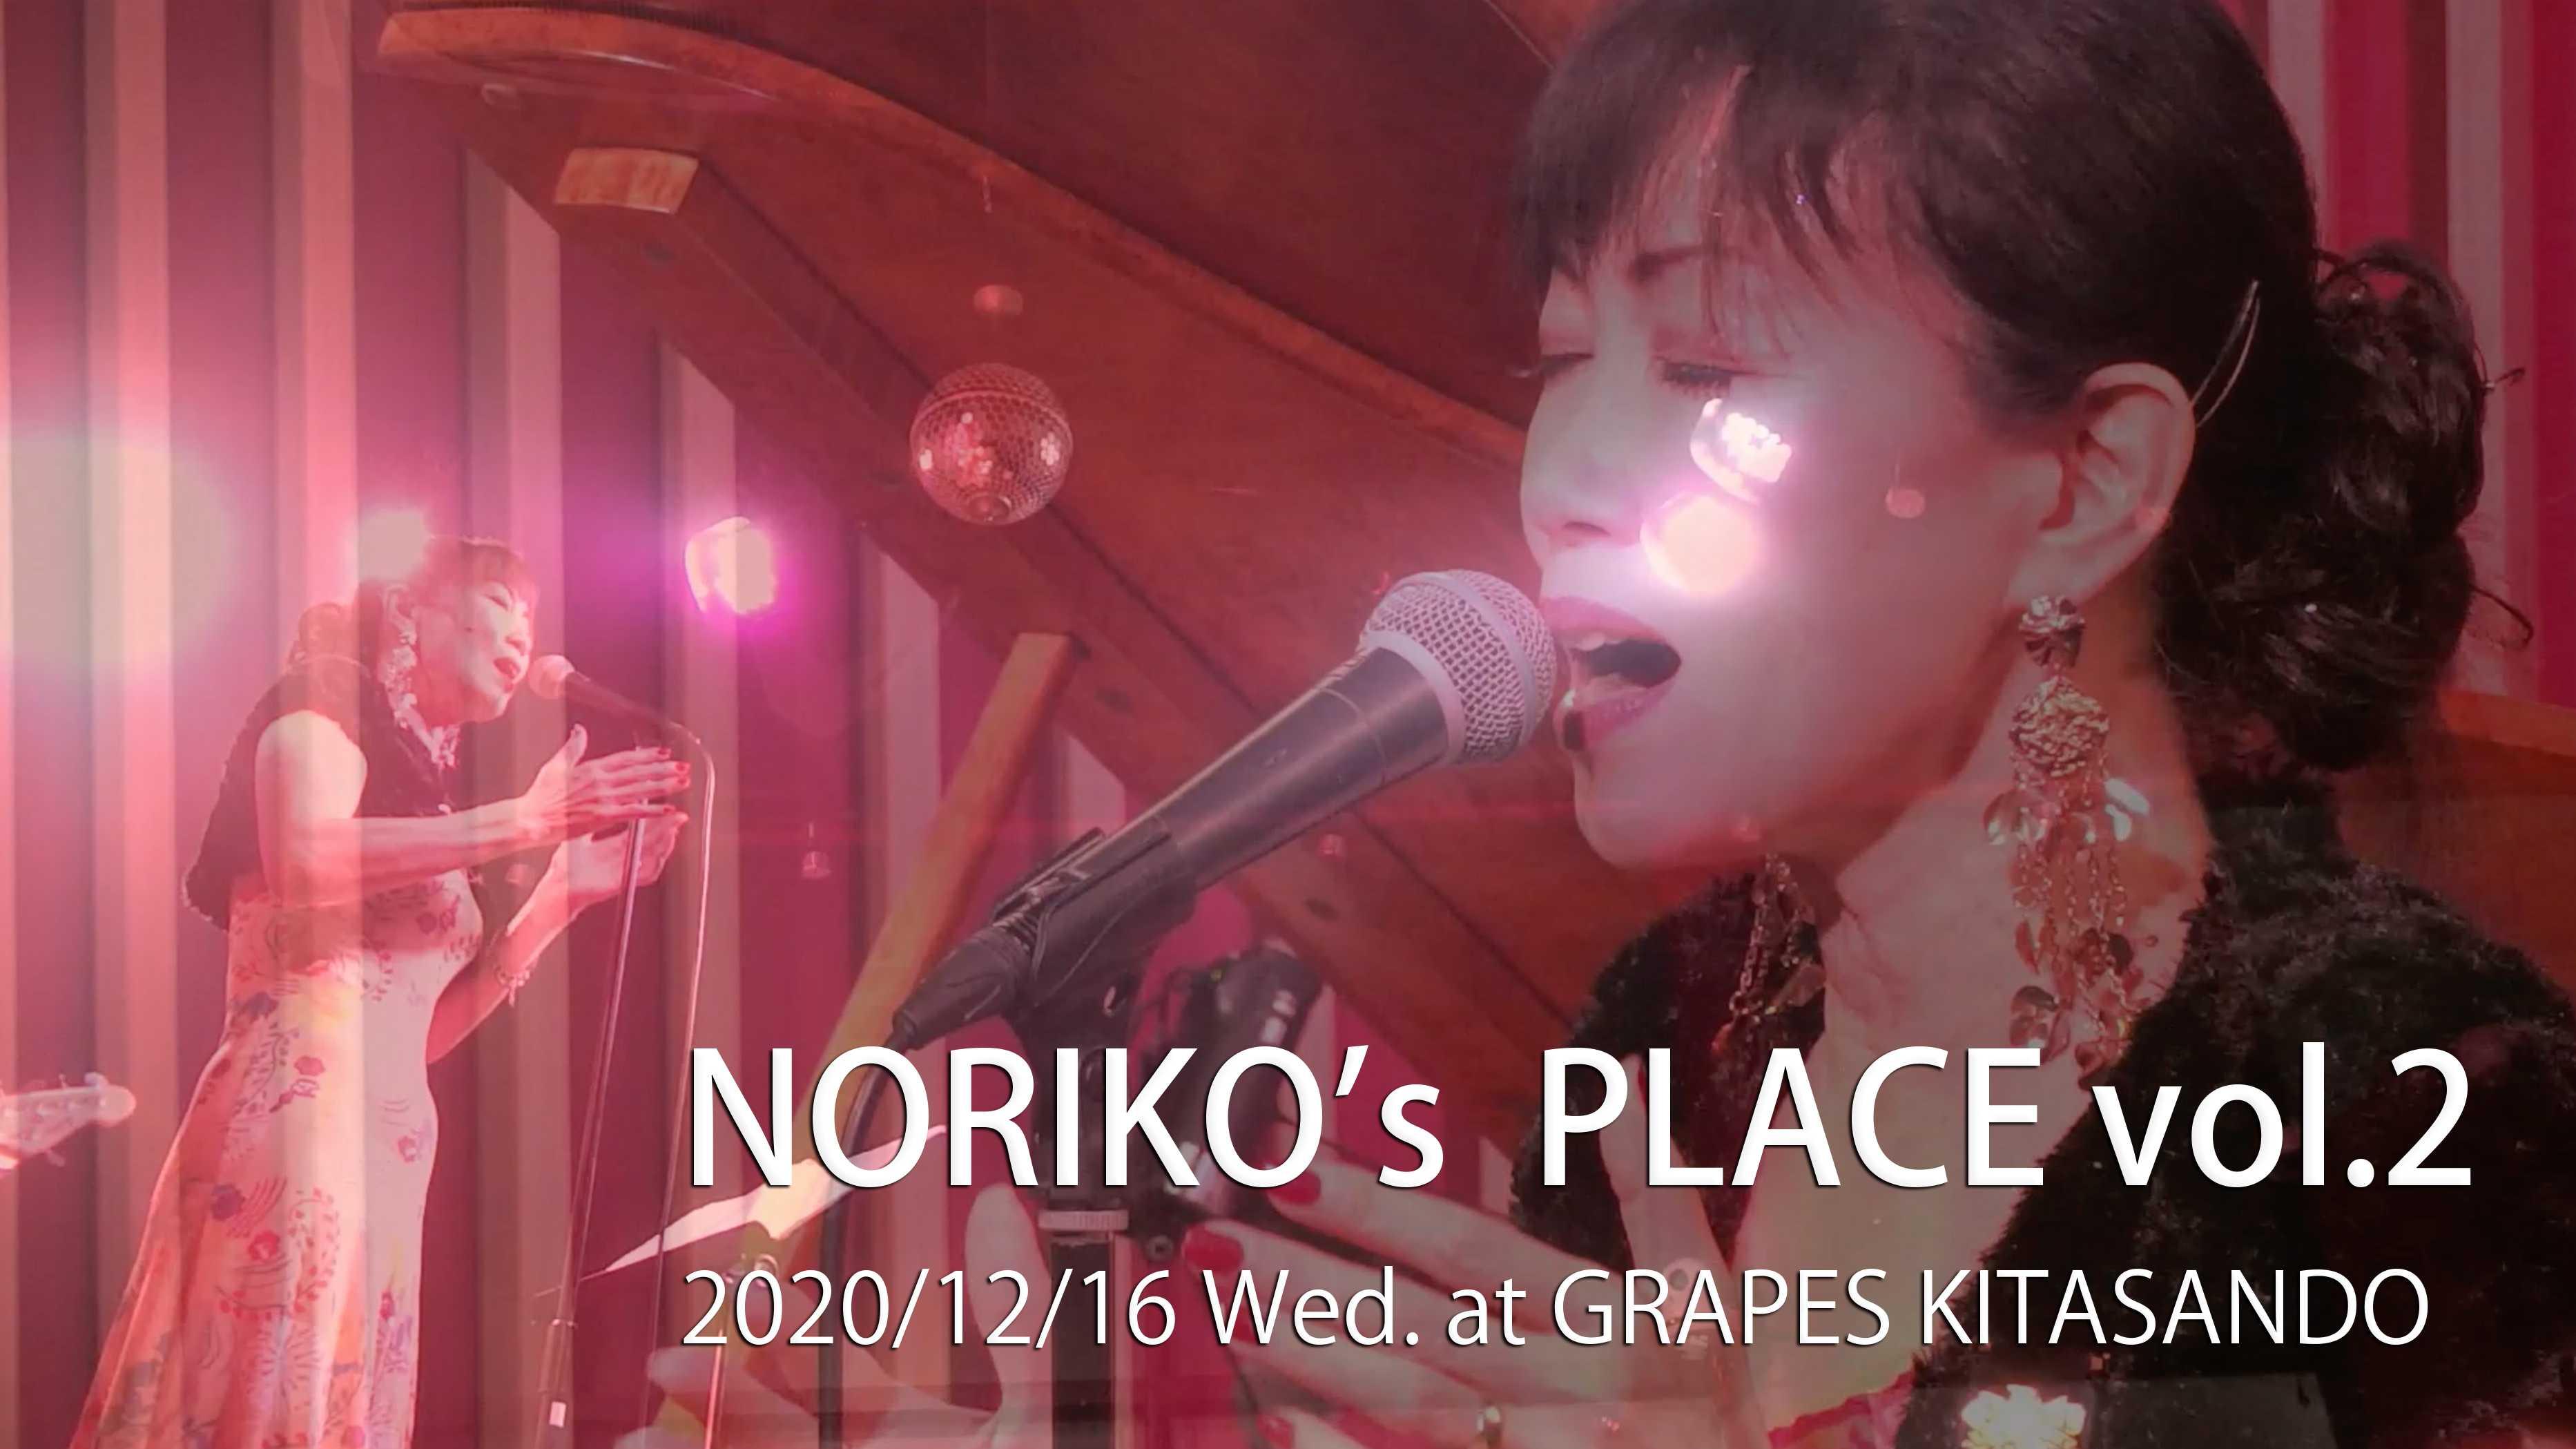 『NORIKO'S PLACE vol.2 』